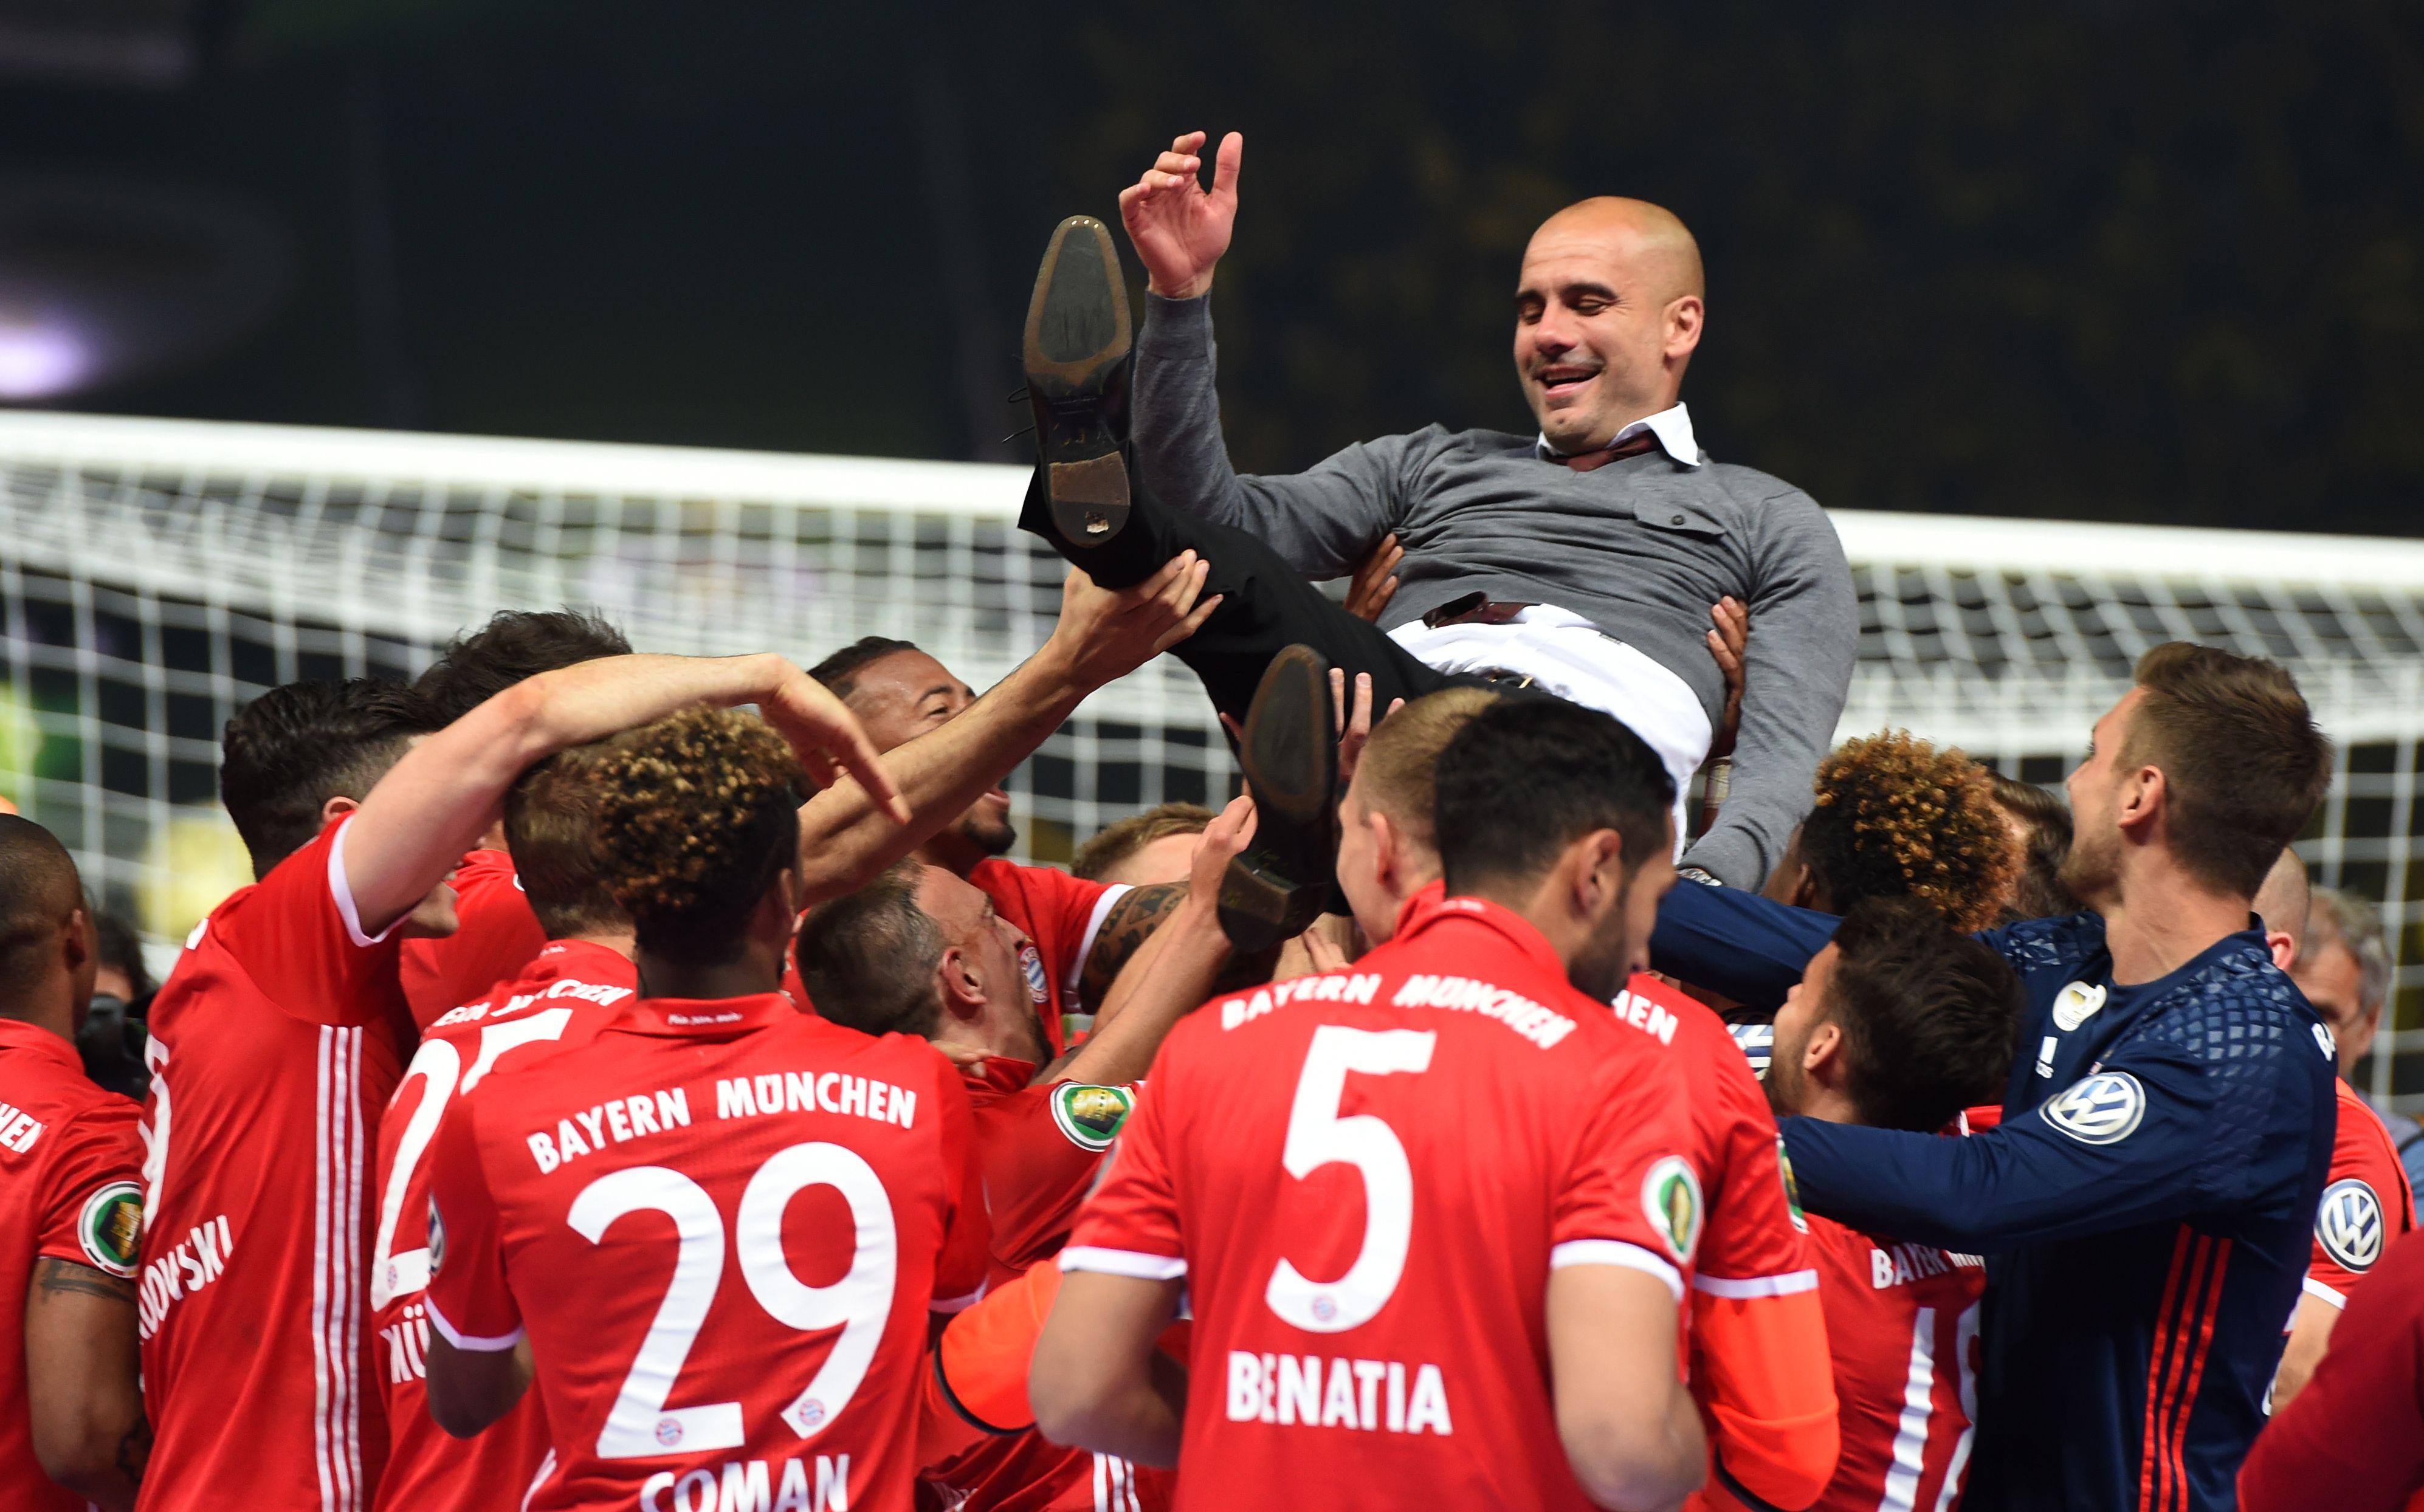 European cup finals round-up: Manchester United, Bayern Munich, PSG victorious - Photos - Sport360